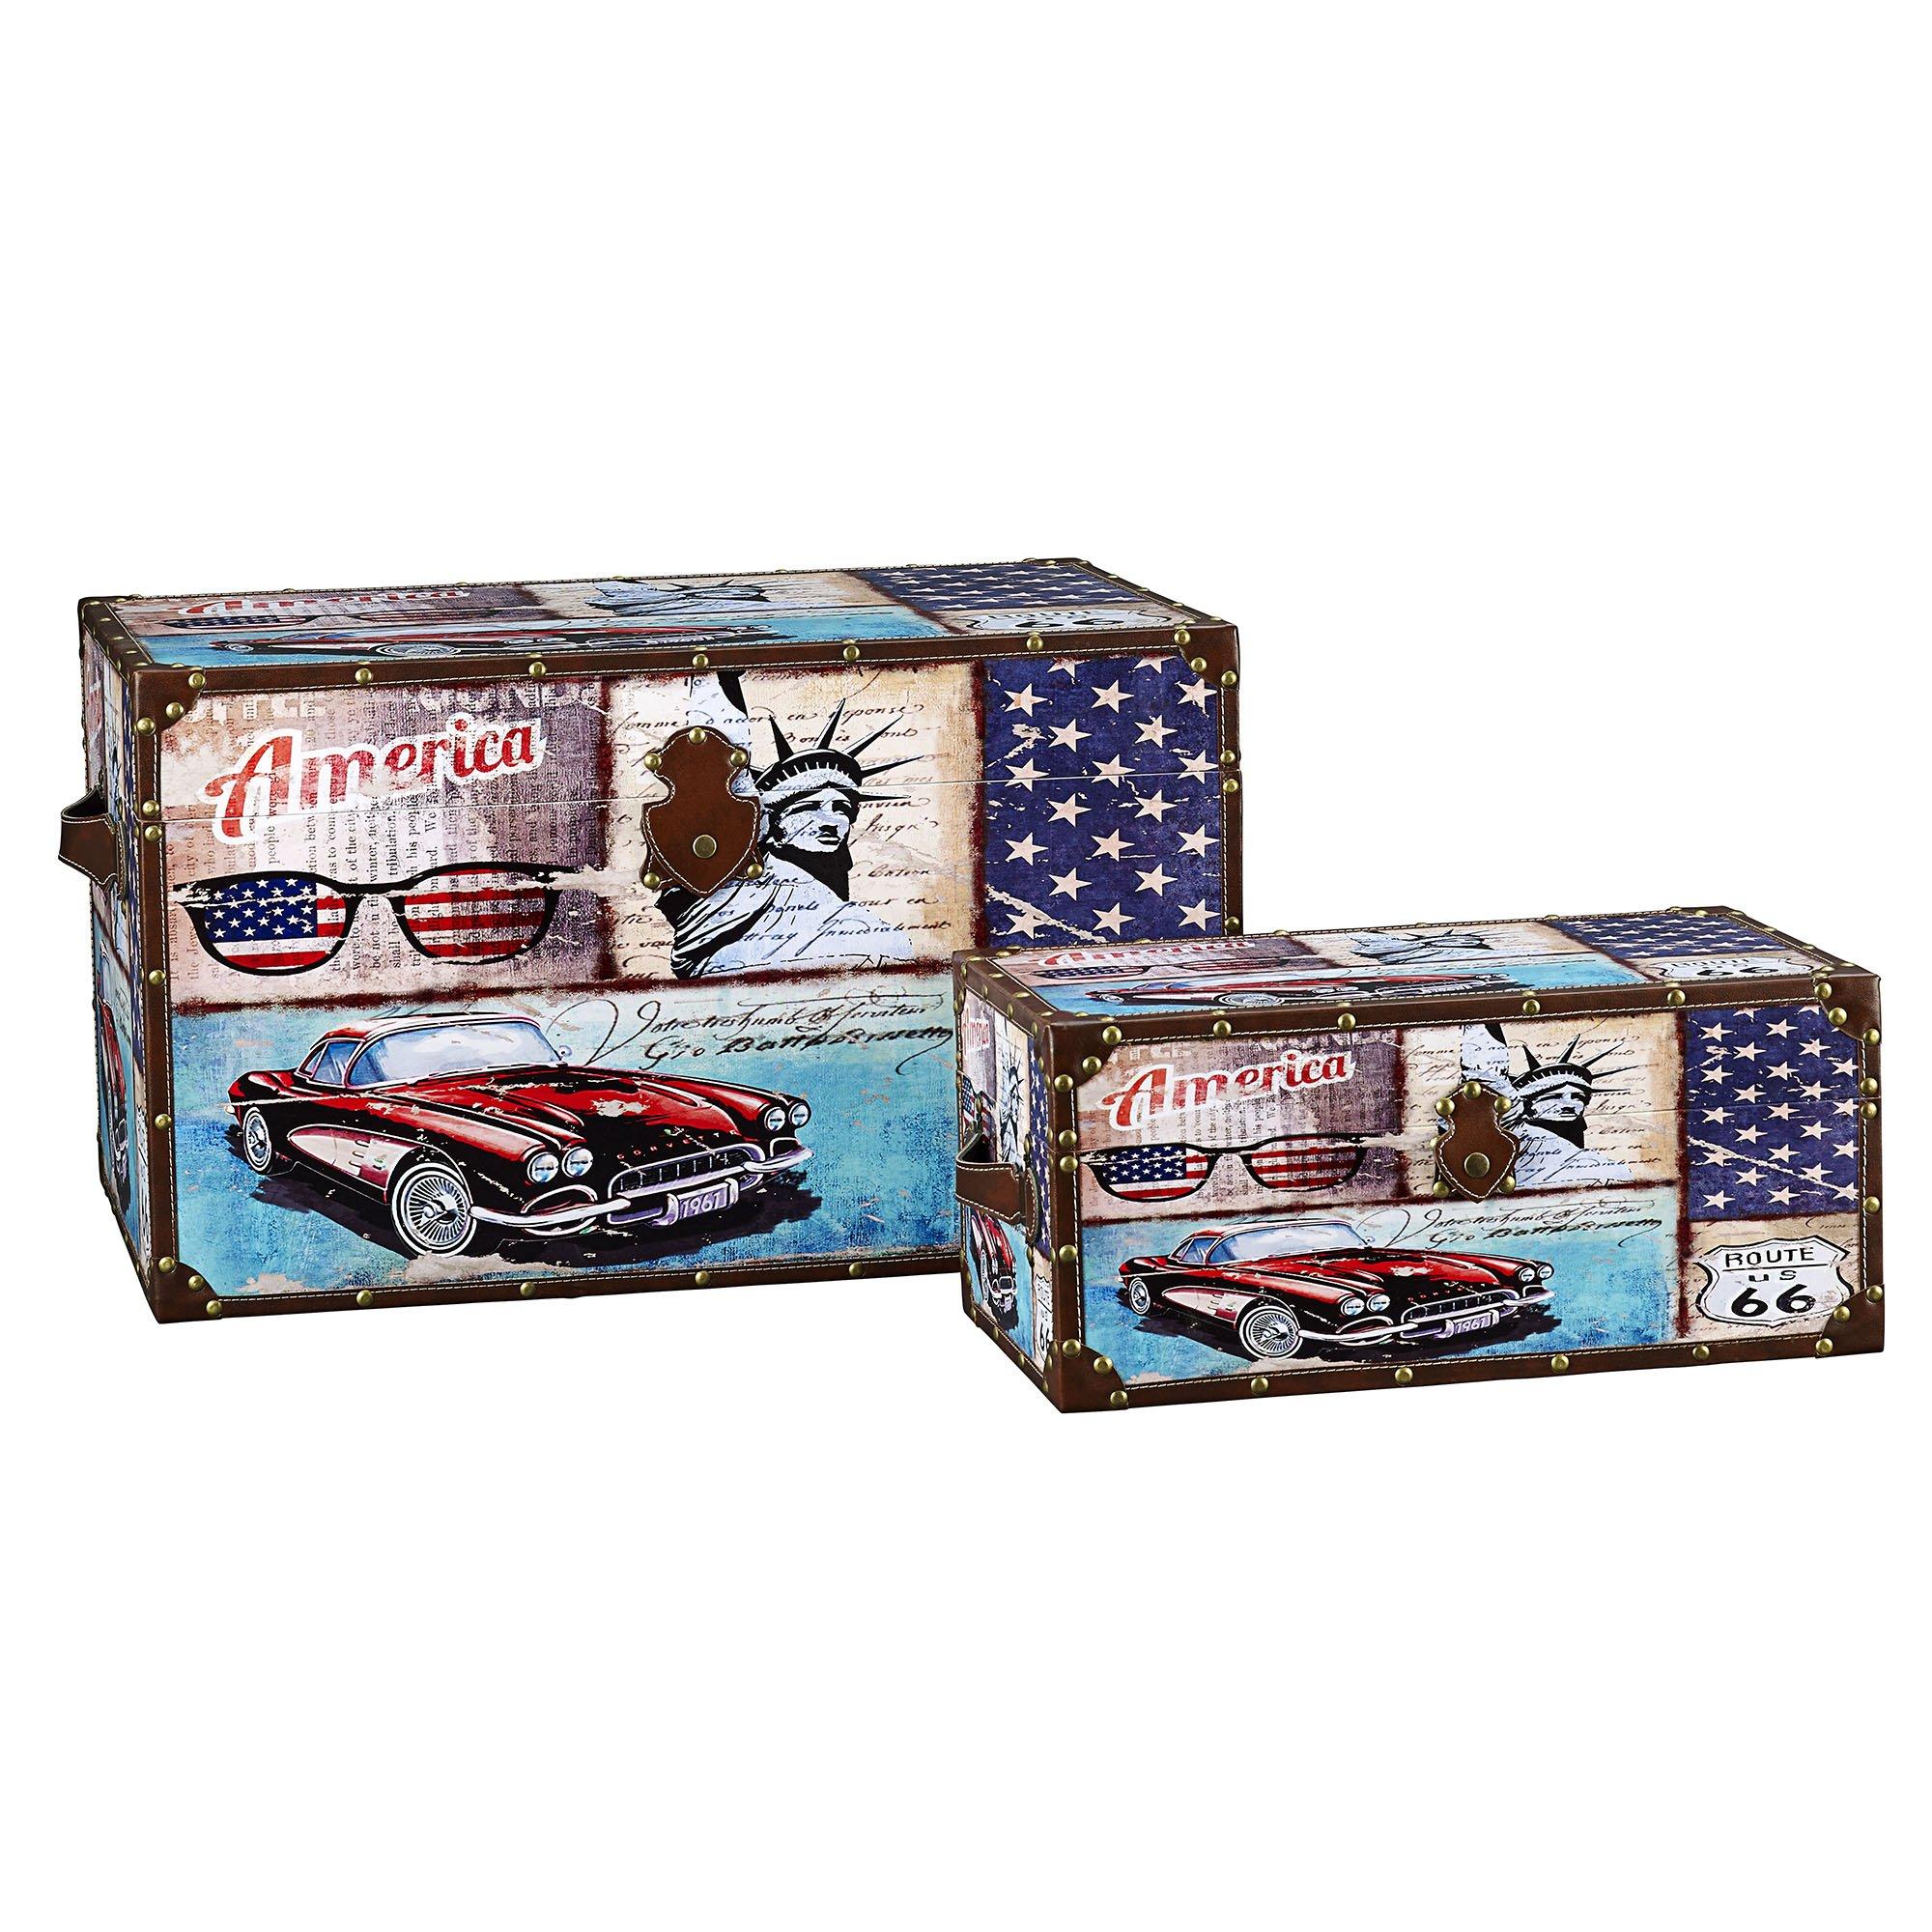 Household Essentials Decorative Storage Trunk Classic Americana Vintage Car Design Set Of 2